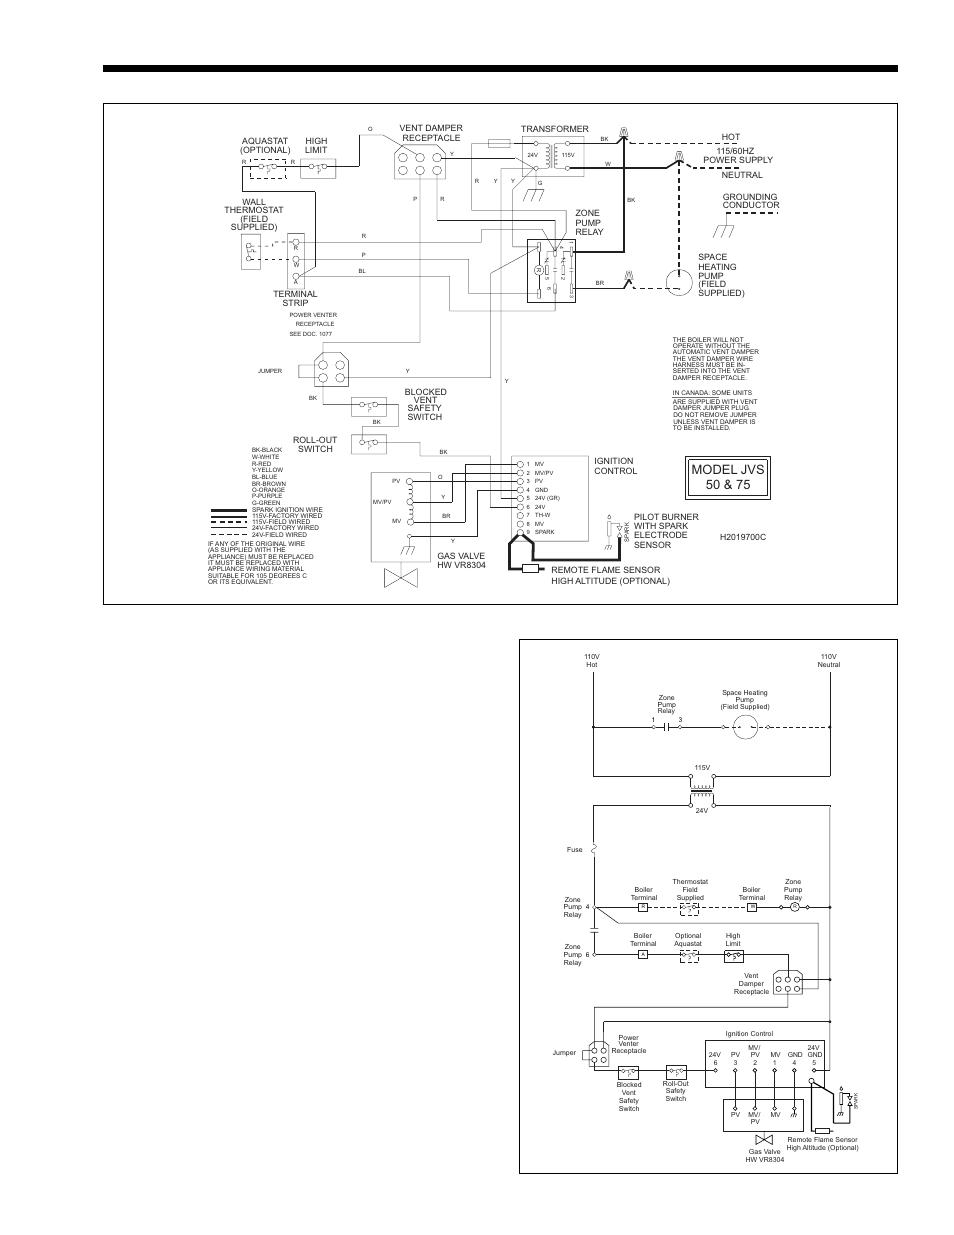 Diagrams1024775 Intertherm Wiring Diagram Electric Furnace – Intertherm Furnace Damper Wiring-diagram